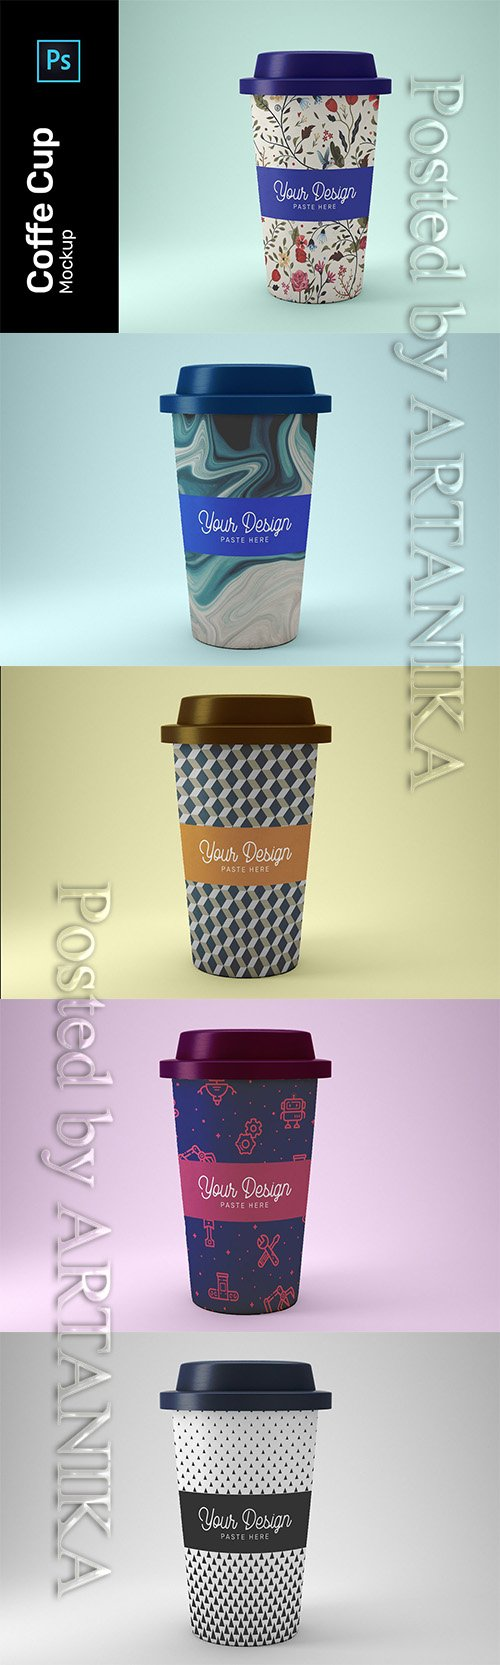 Coffe Cup Mockup PSD 3482333